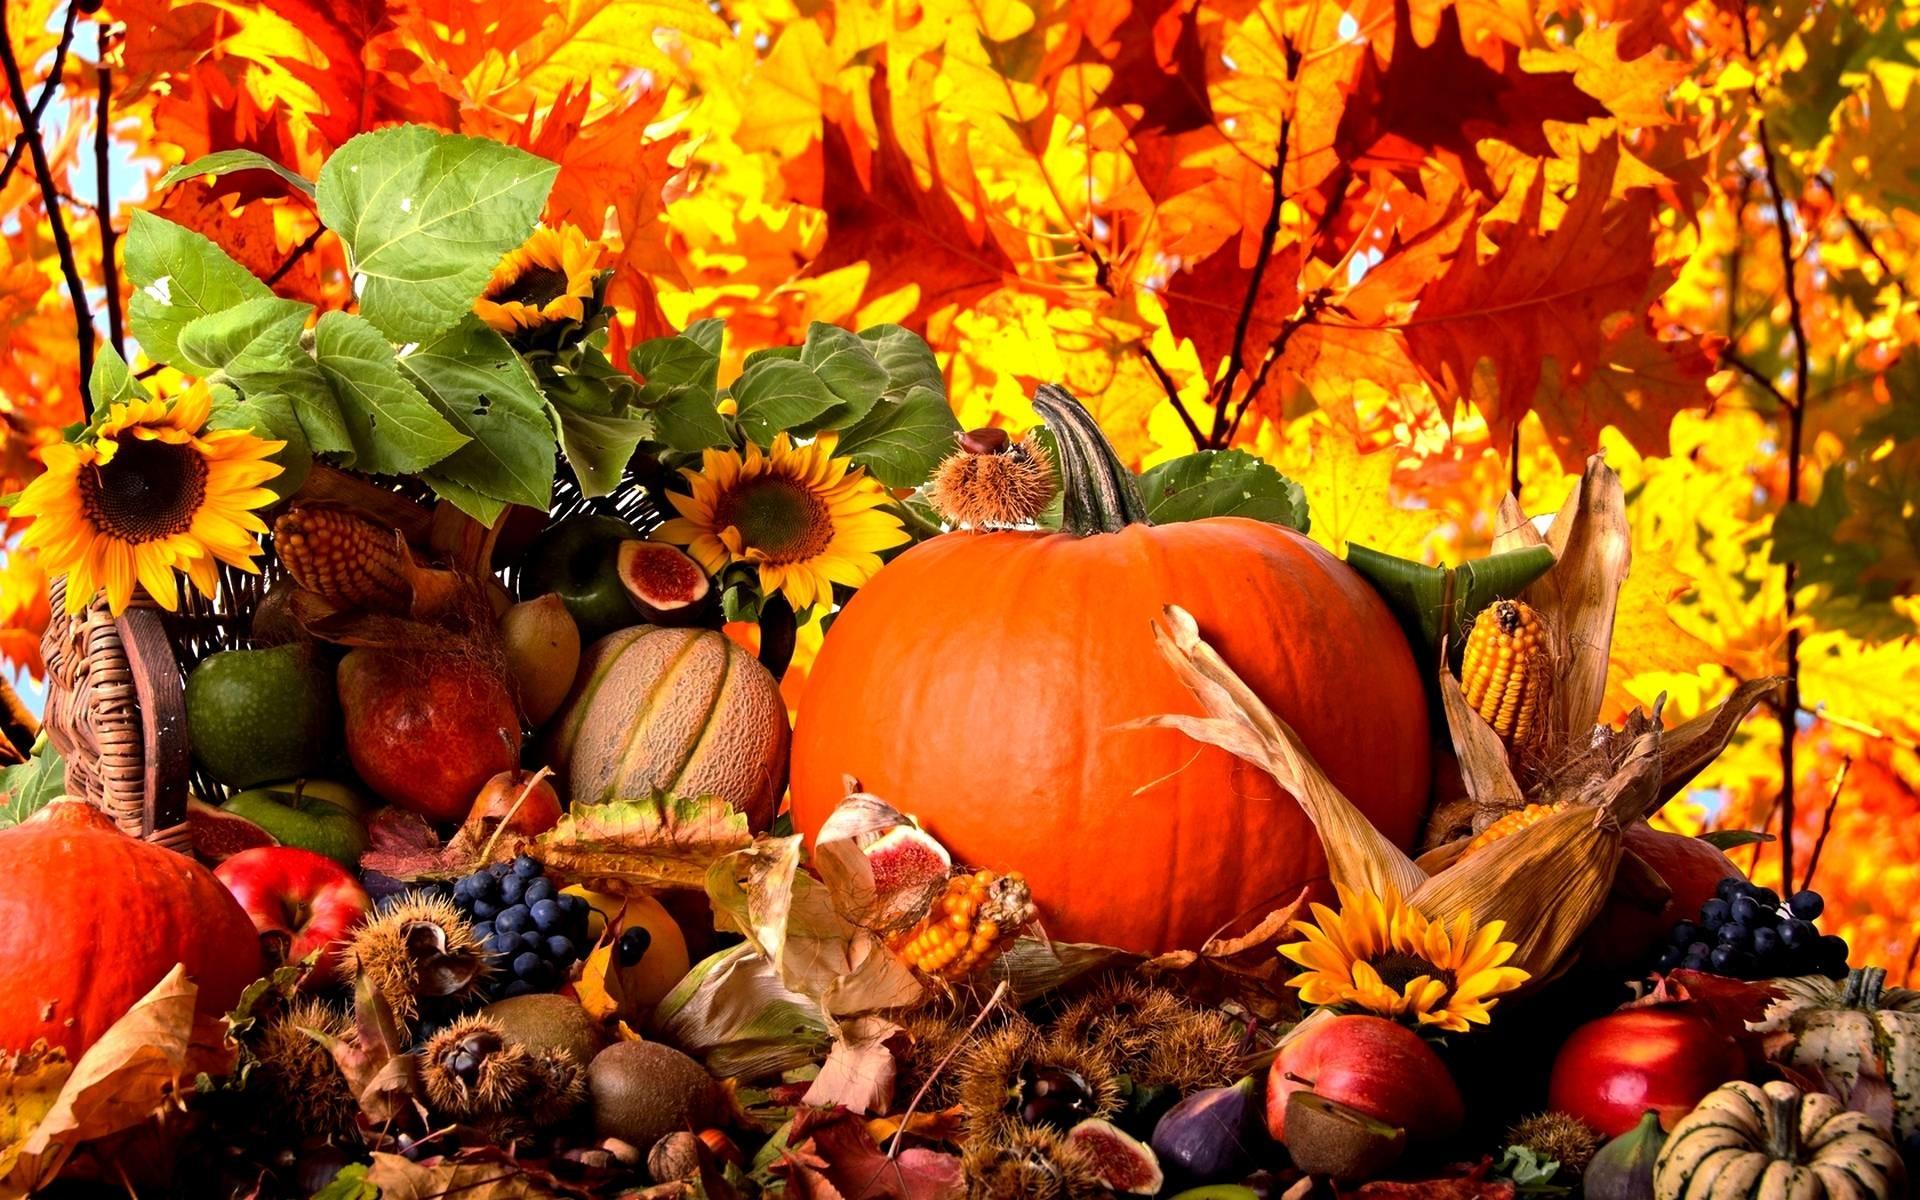 Fall Harvest Wallpaper High Quality